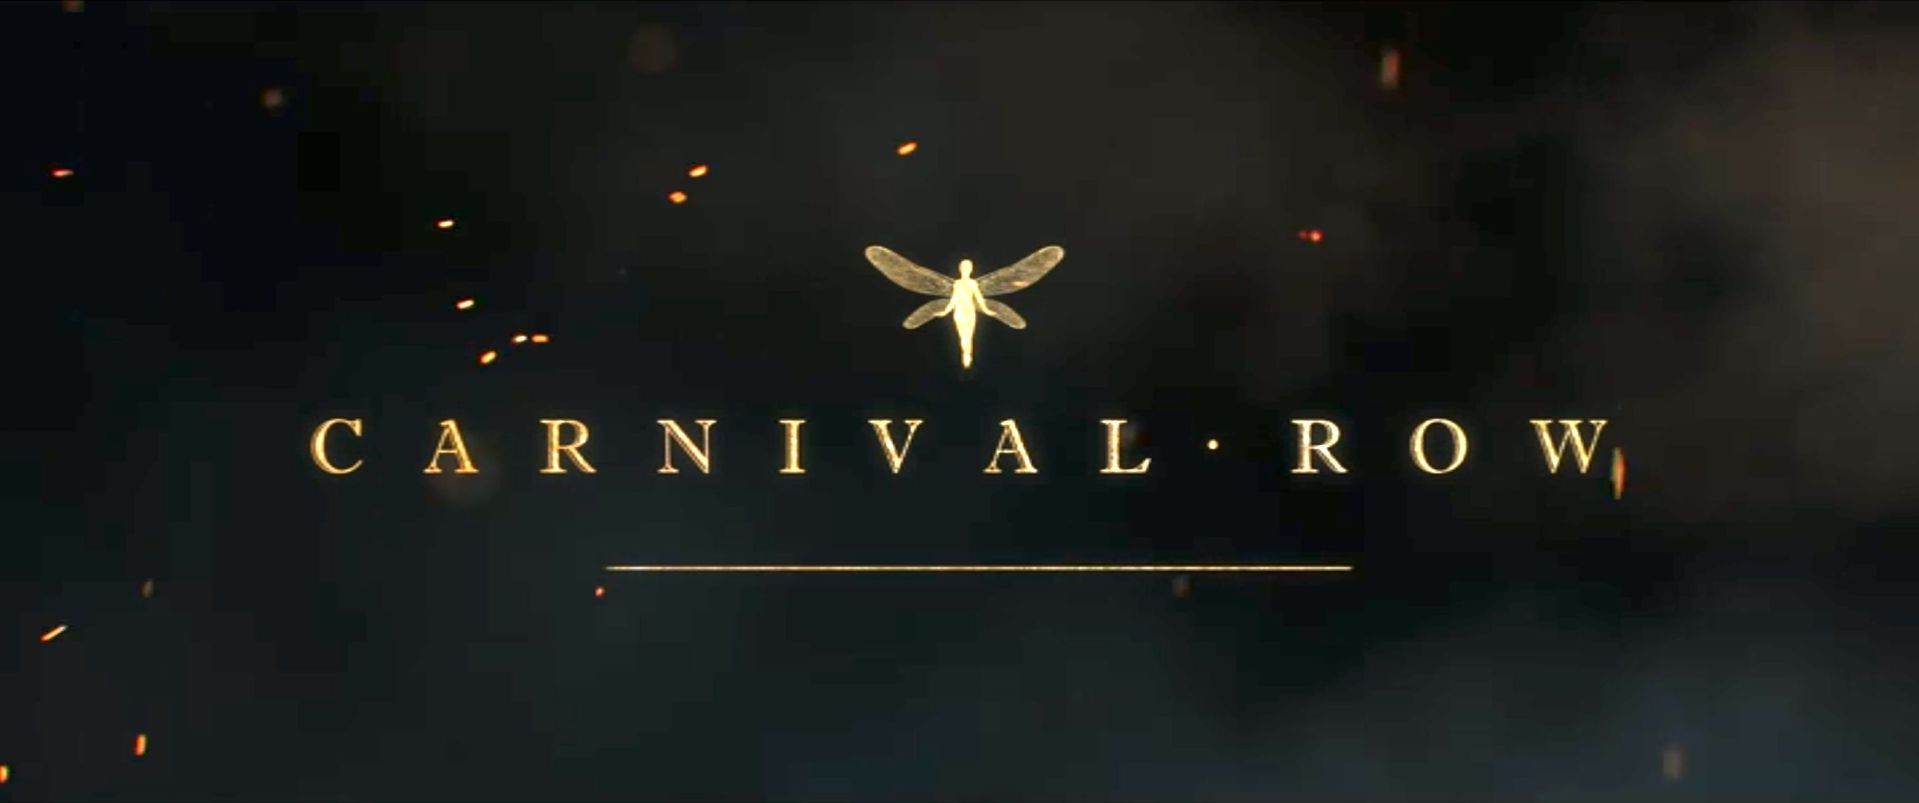 Carnival Row Title - Amazon Prime Screen Capture